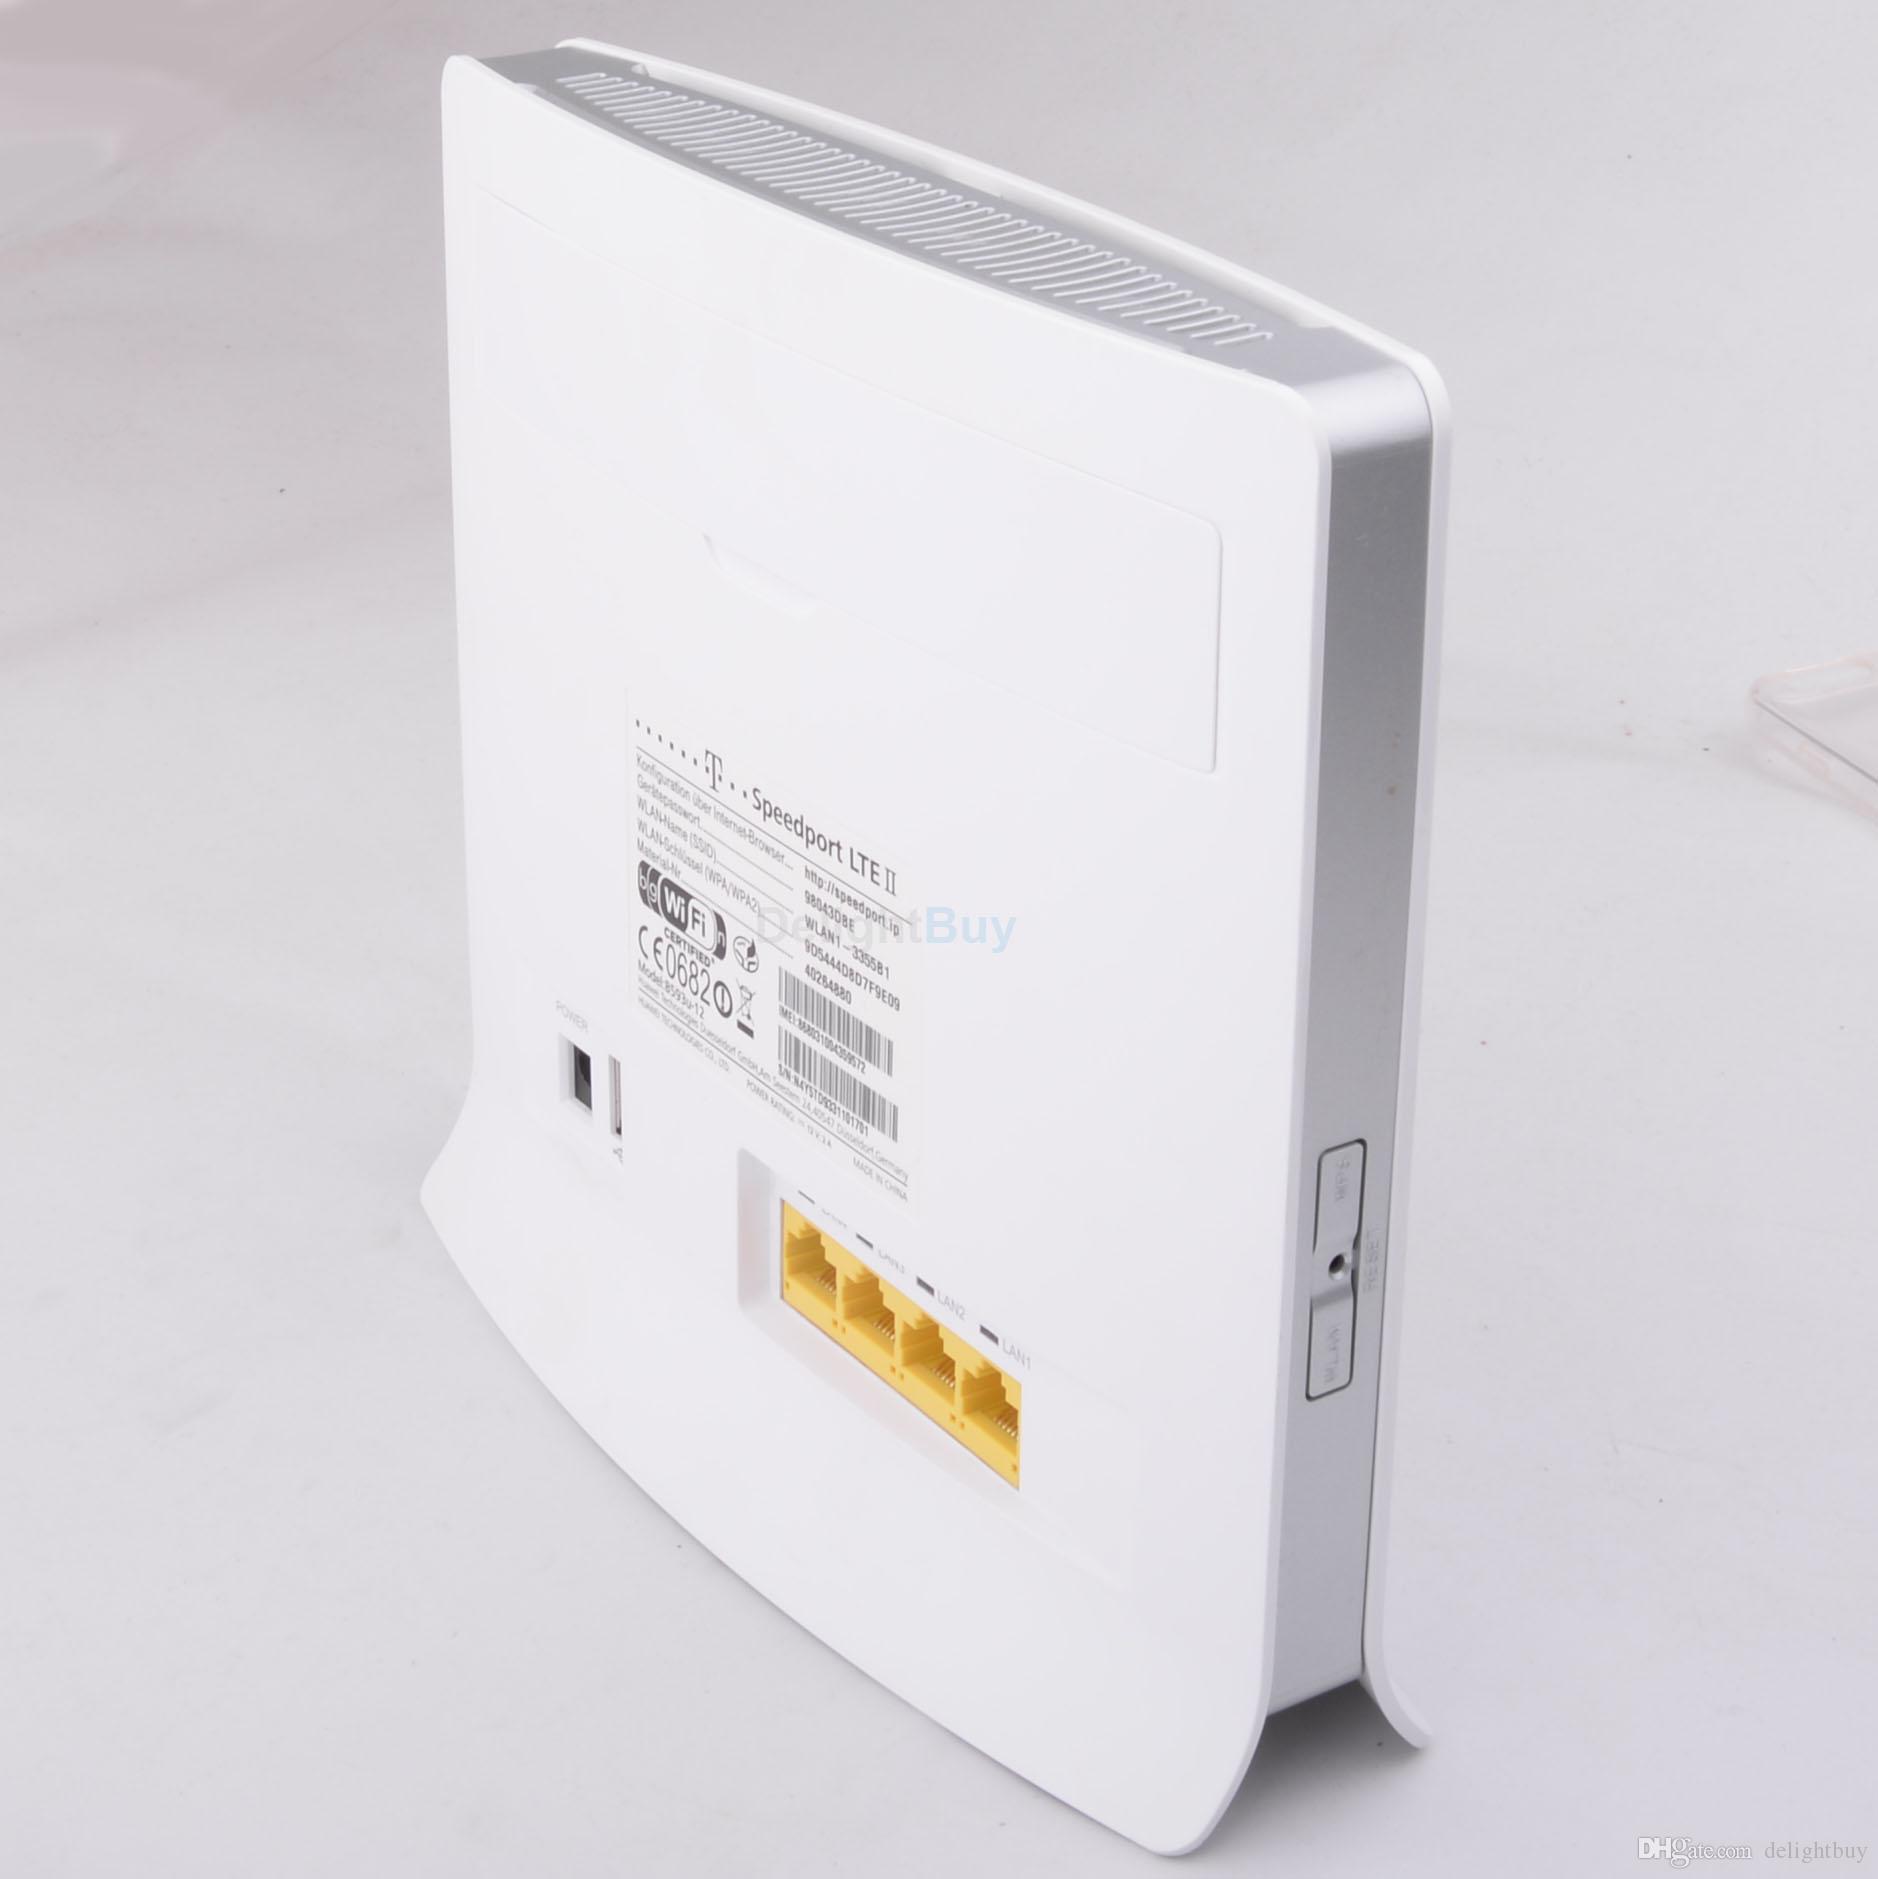 Desbloqueado Huawei B593 4G LTE TDD / FDD 4G Roteador Sem Fio 100Mbps WiFi Hotspot SIM Slot B593U-12